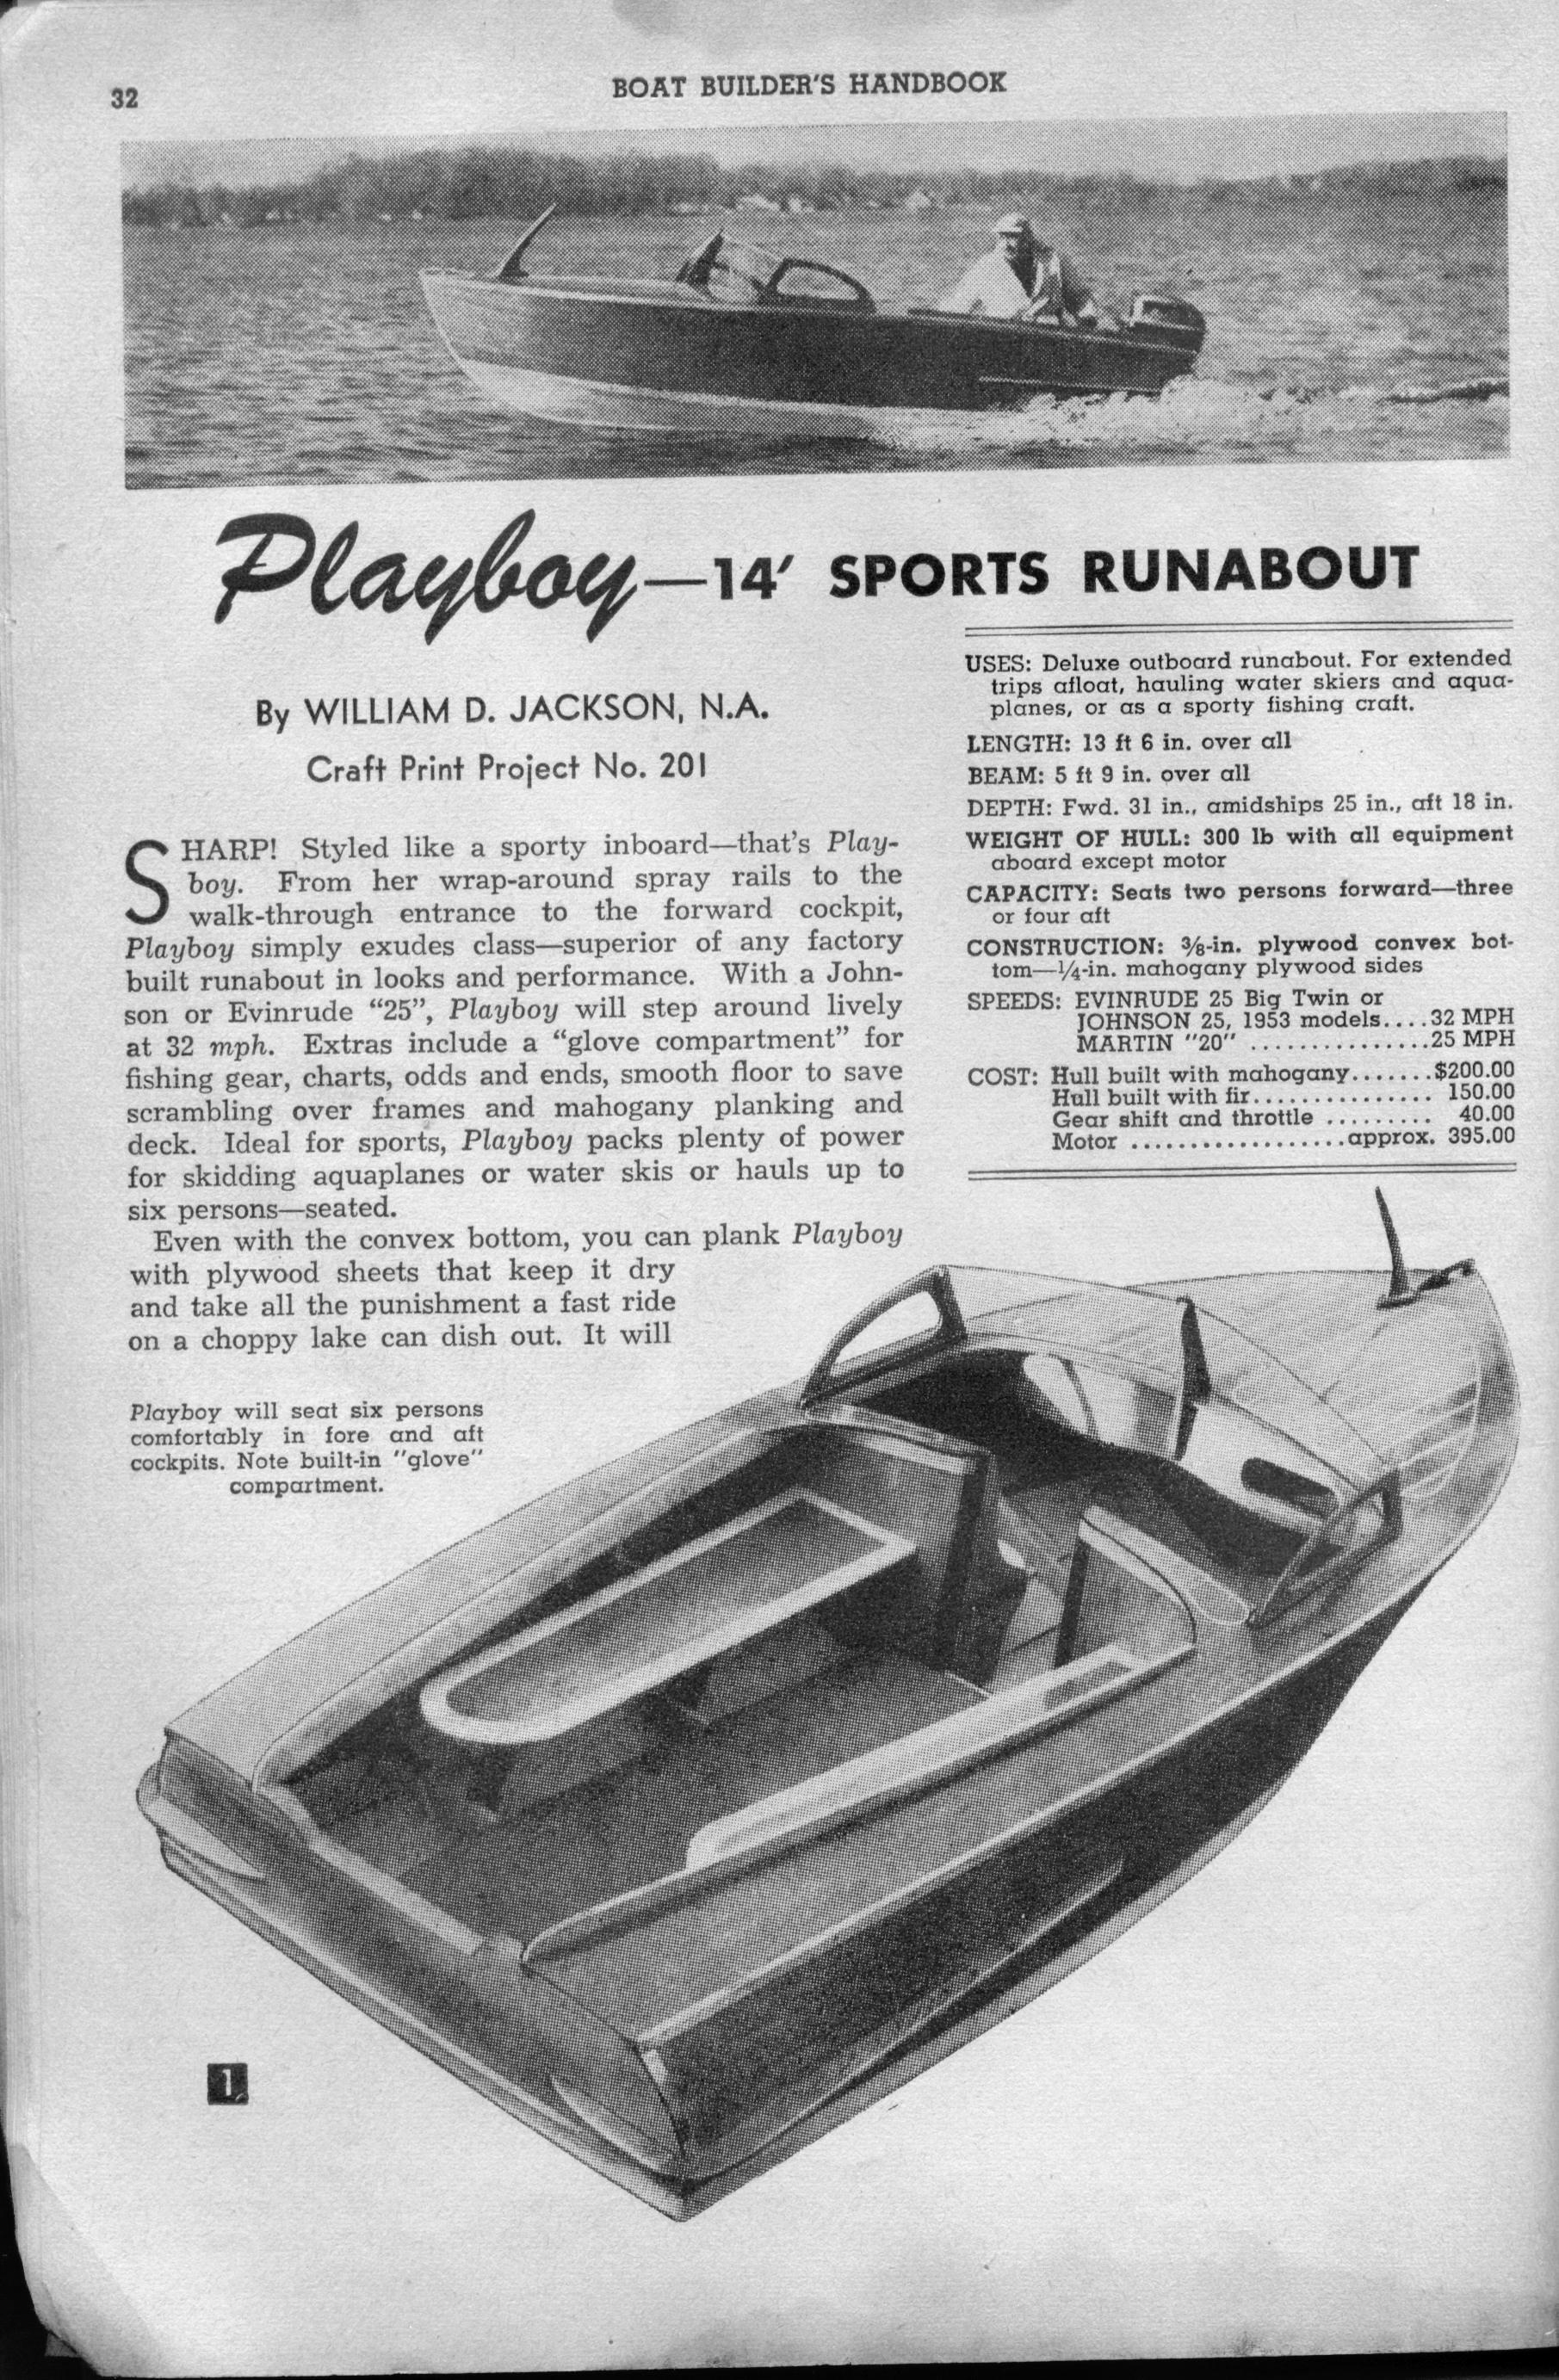 www svensons com - Free Boat Plans From